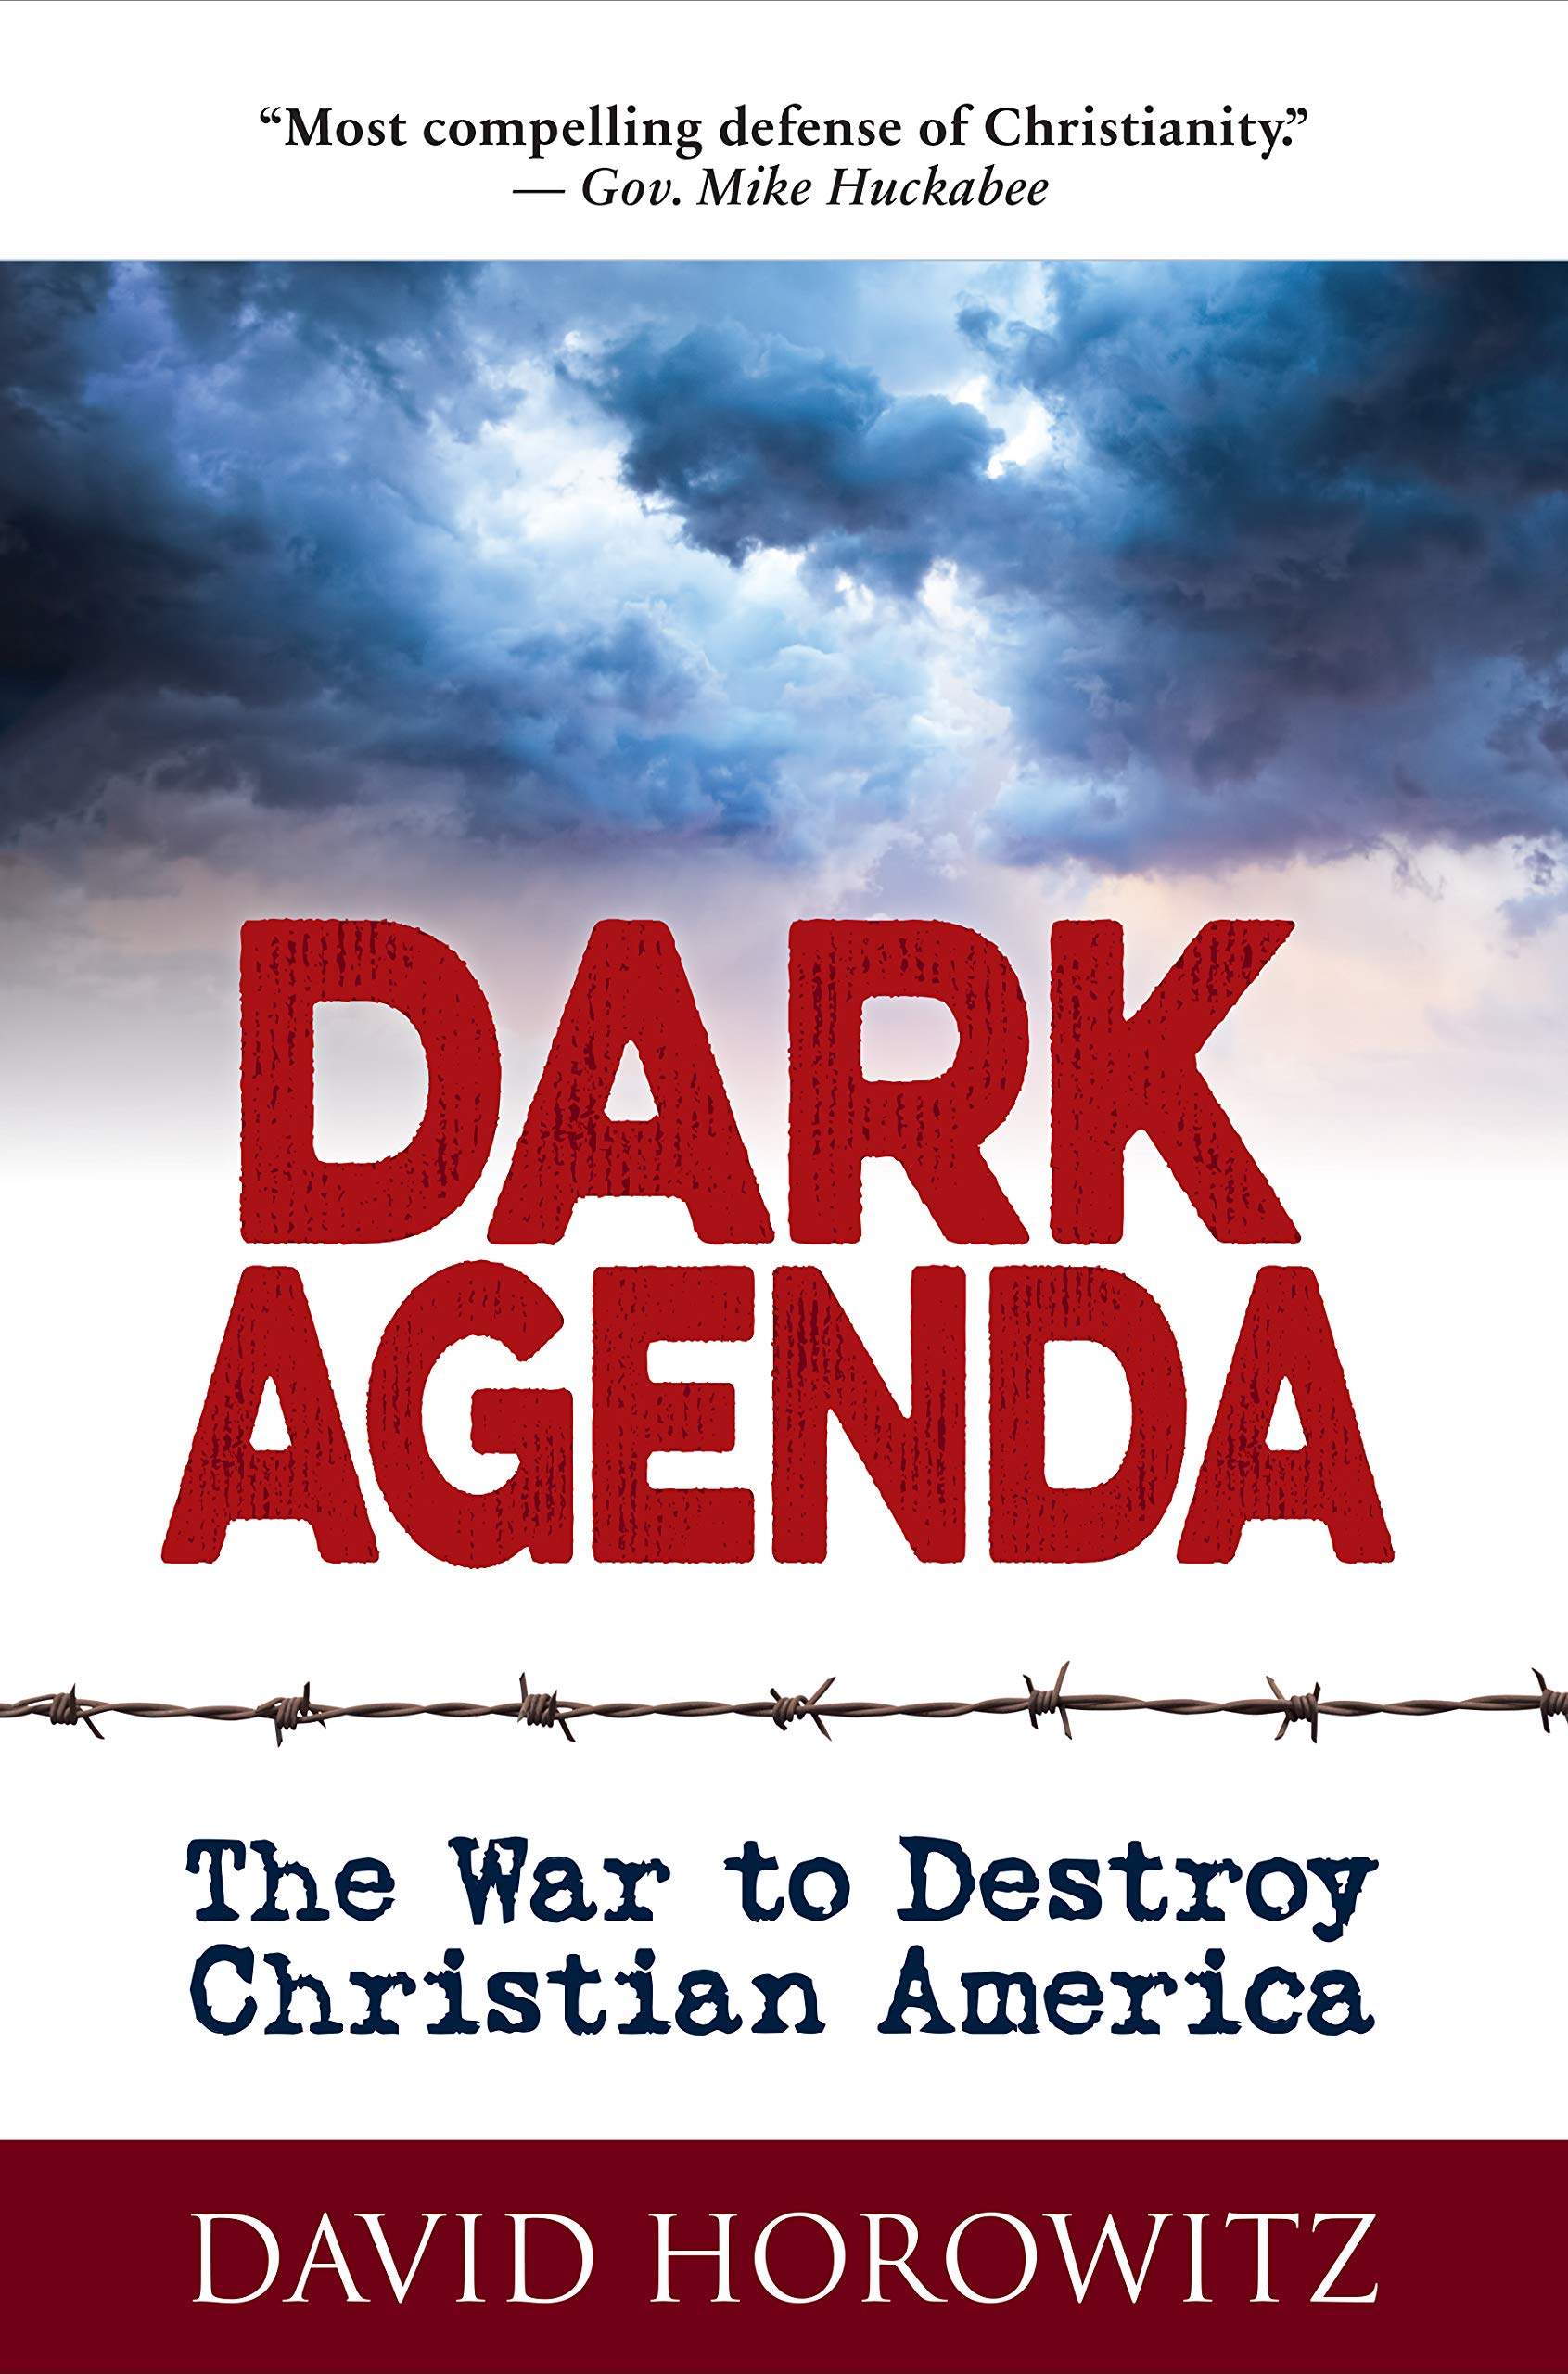 DARK AGENDA: The War to Destroy Christian America by Humanix Books